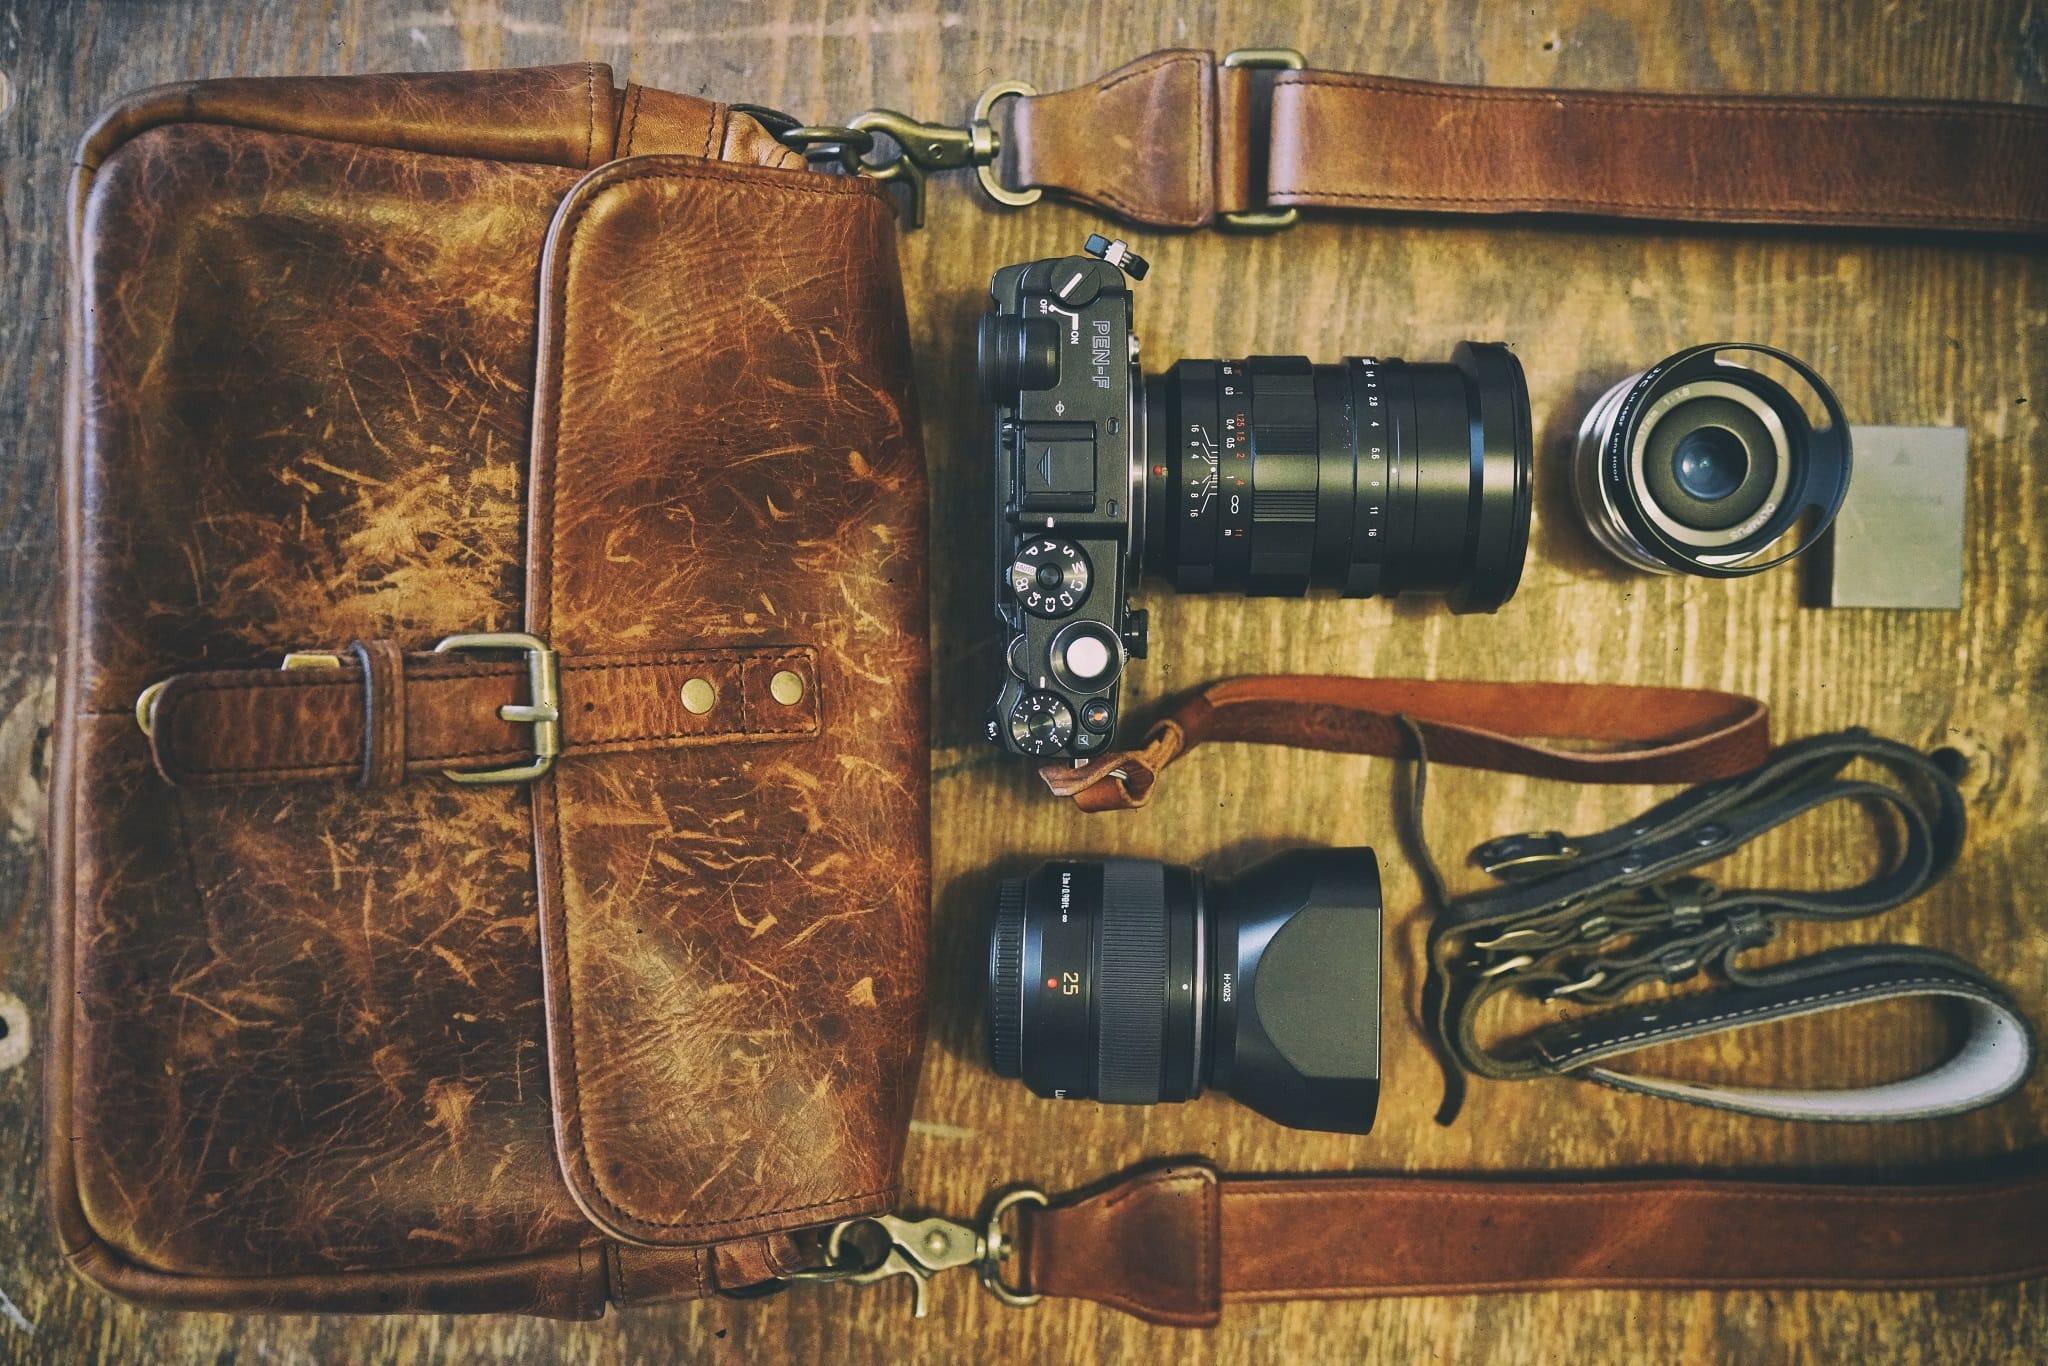 Nicholas Goodden's Camera Bag